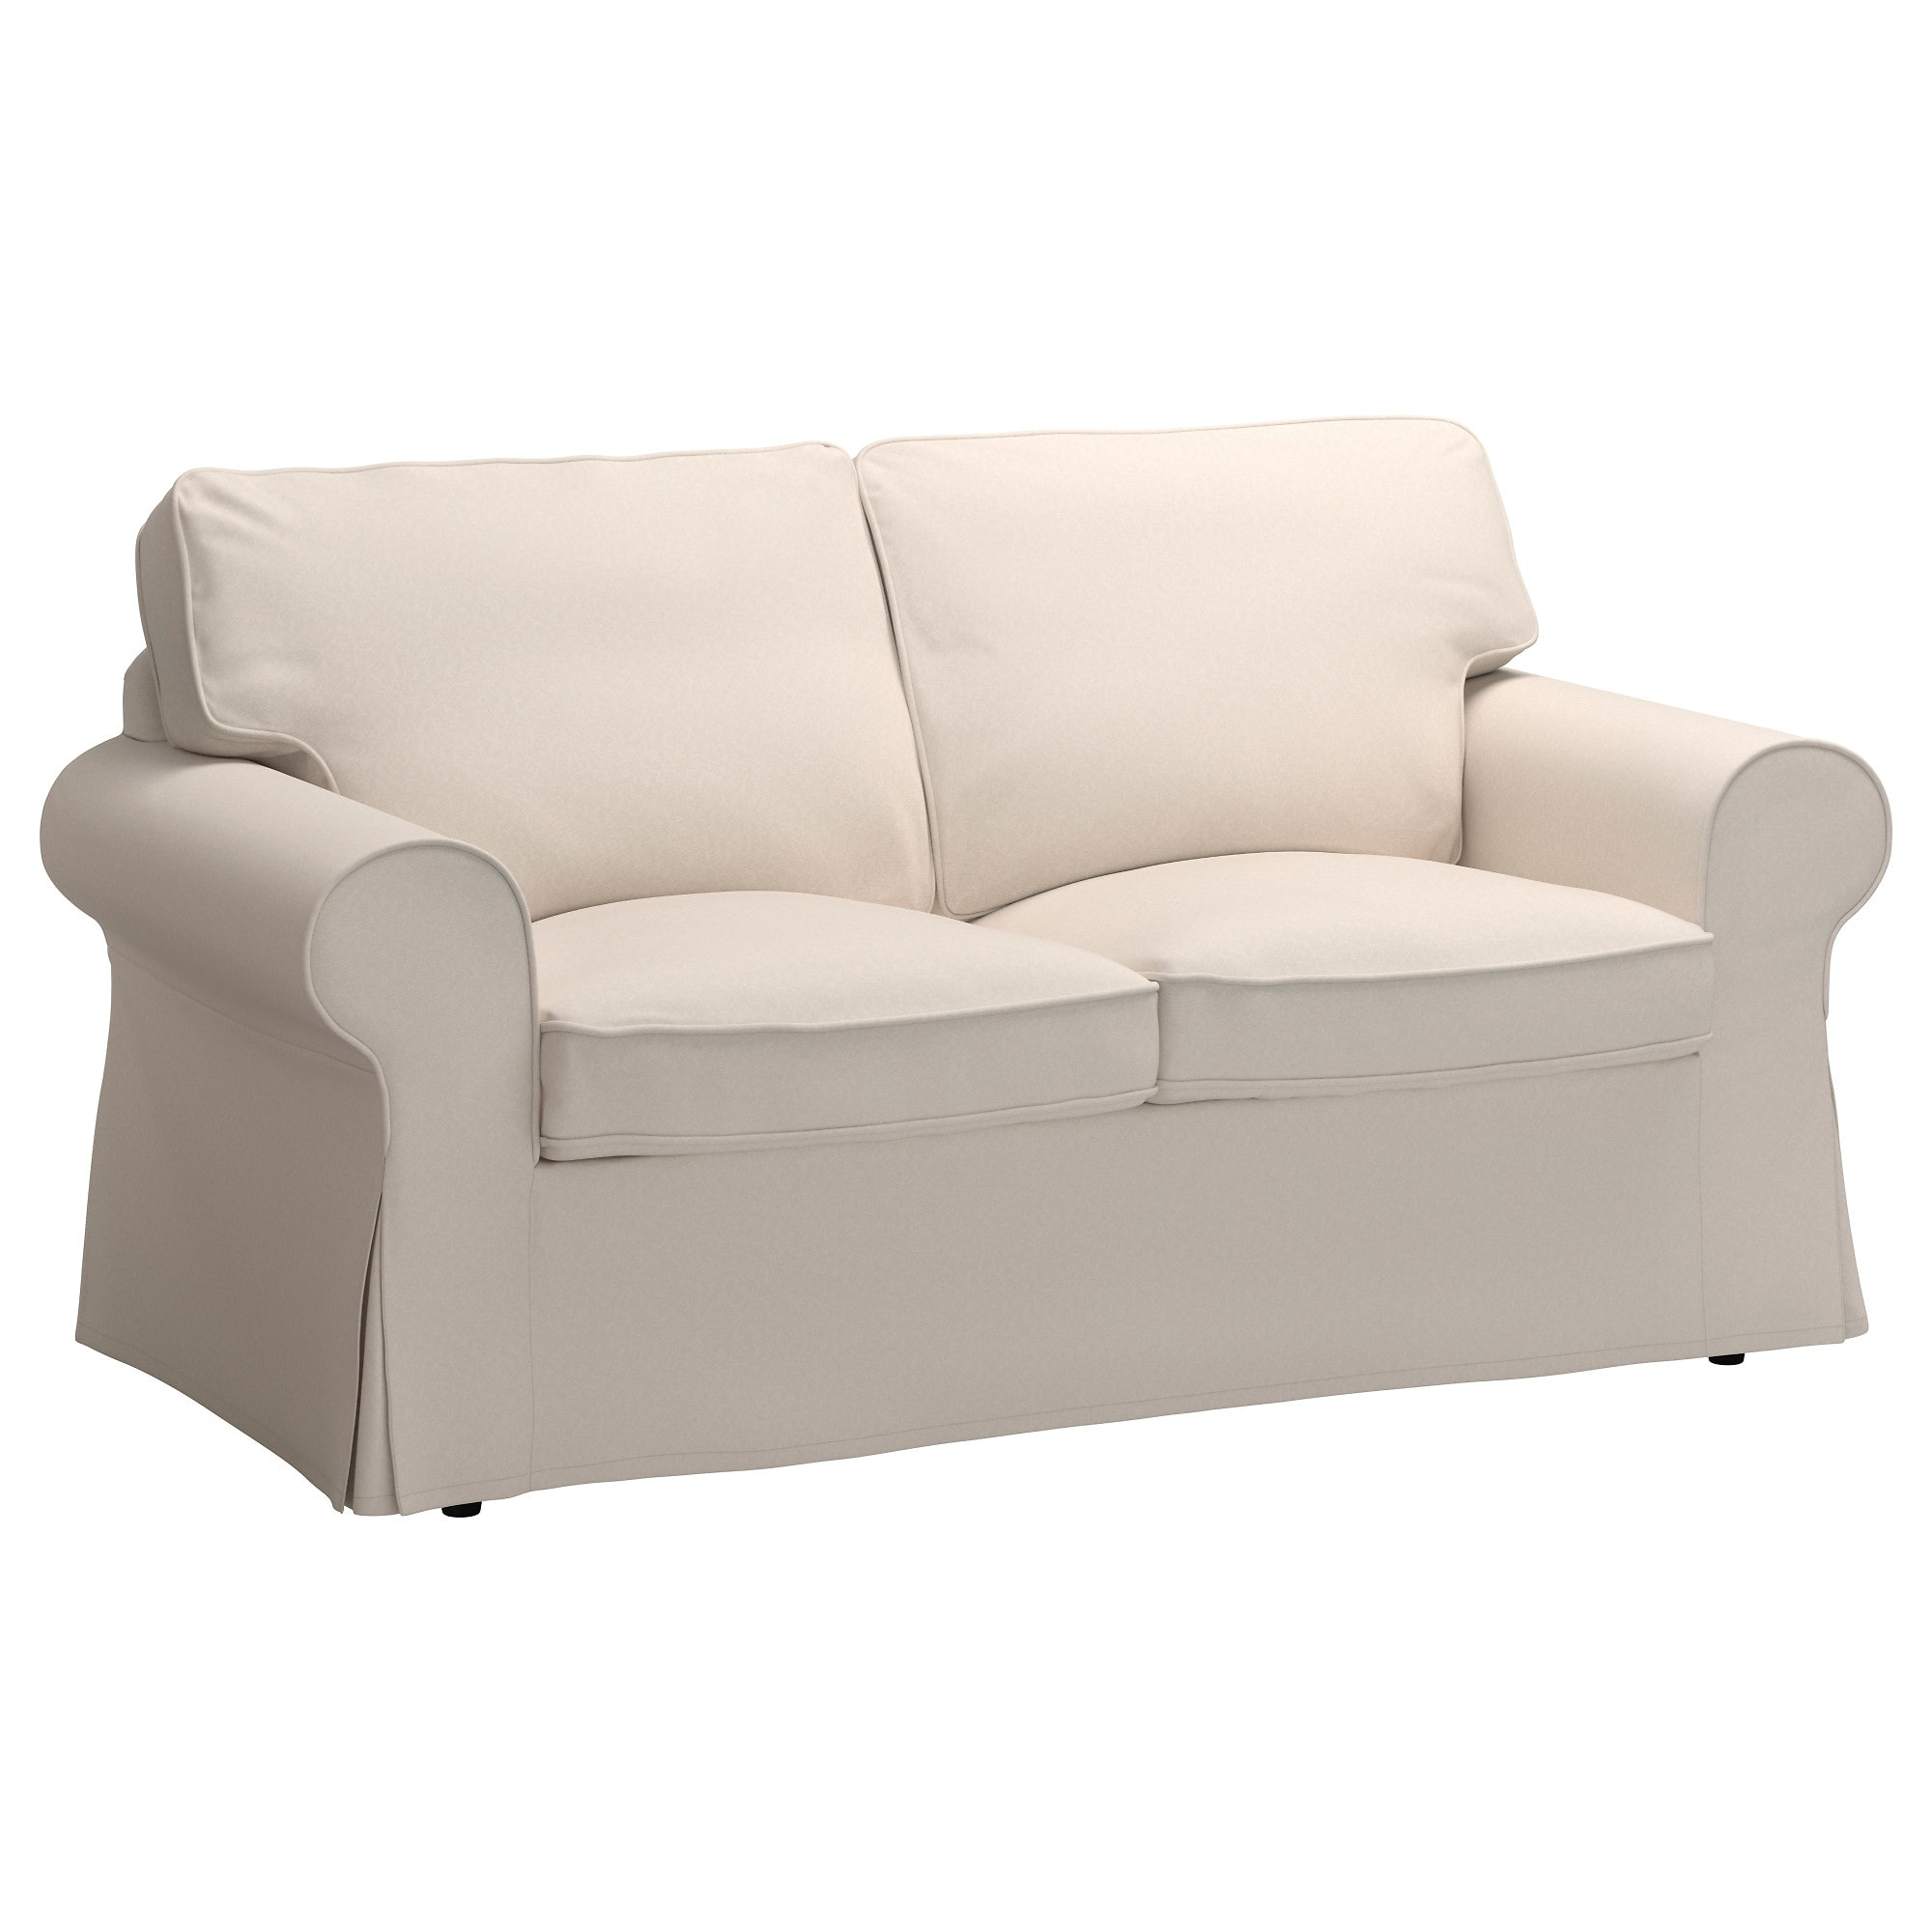 Sofa Relax Ikea Tldn sofas Armchairs Ikea